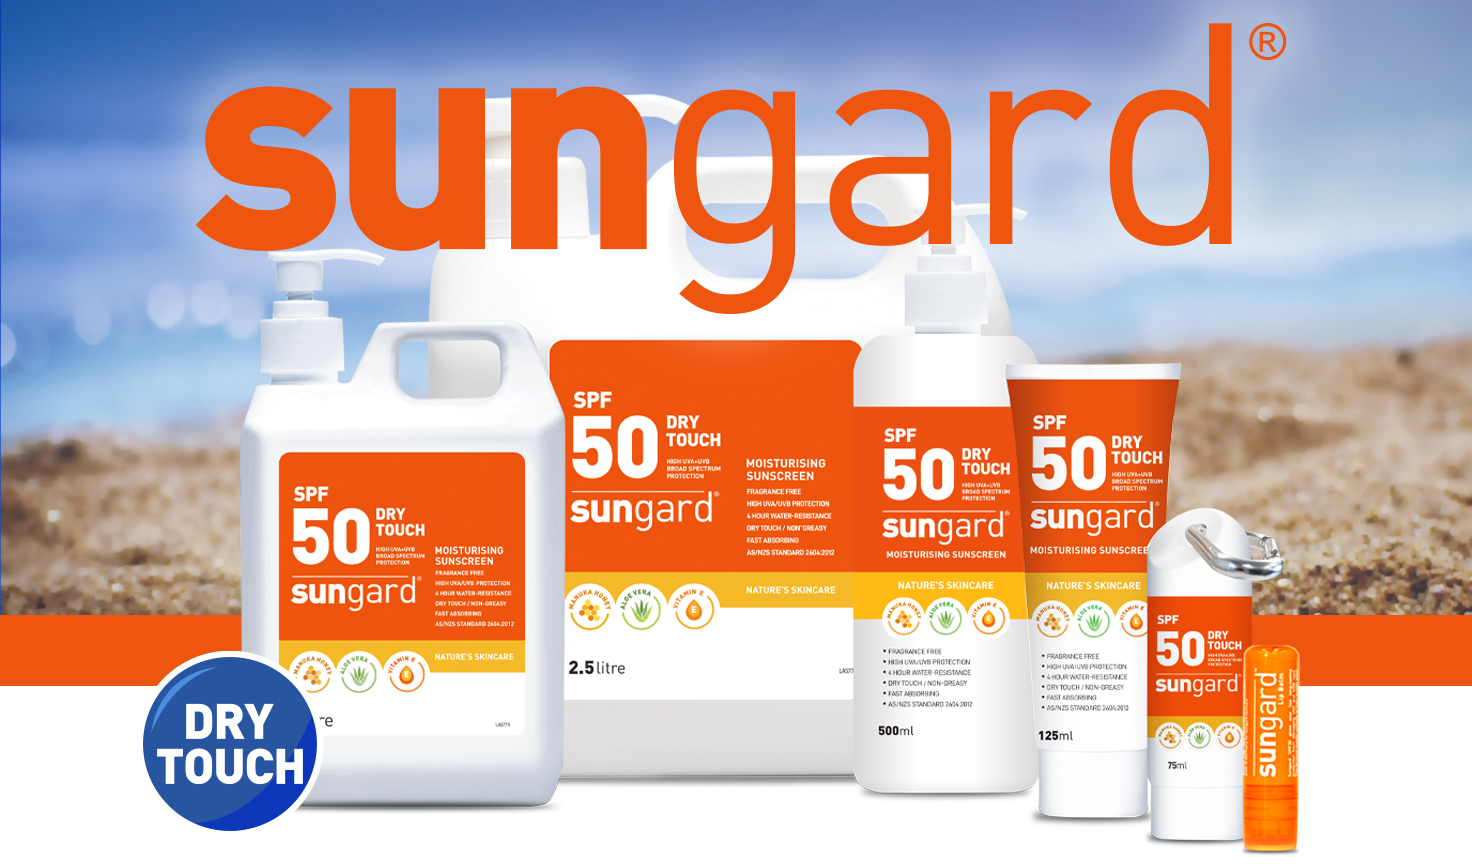 sungard-imagery-website.jpg